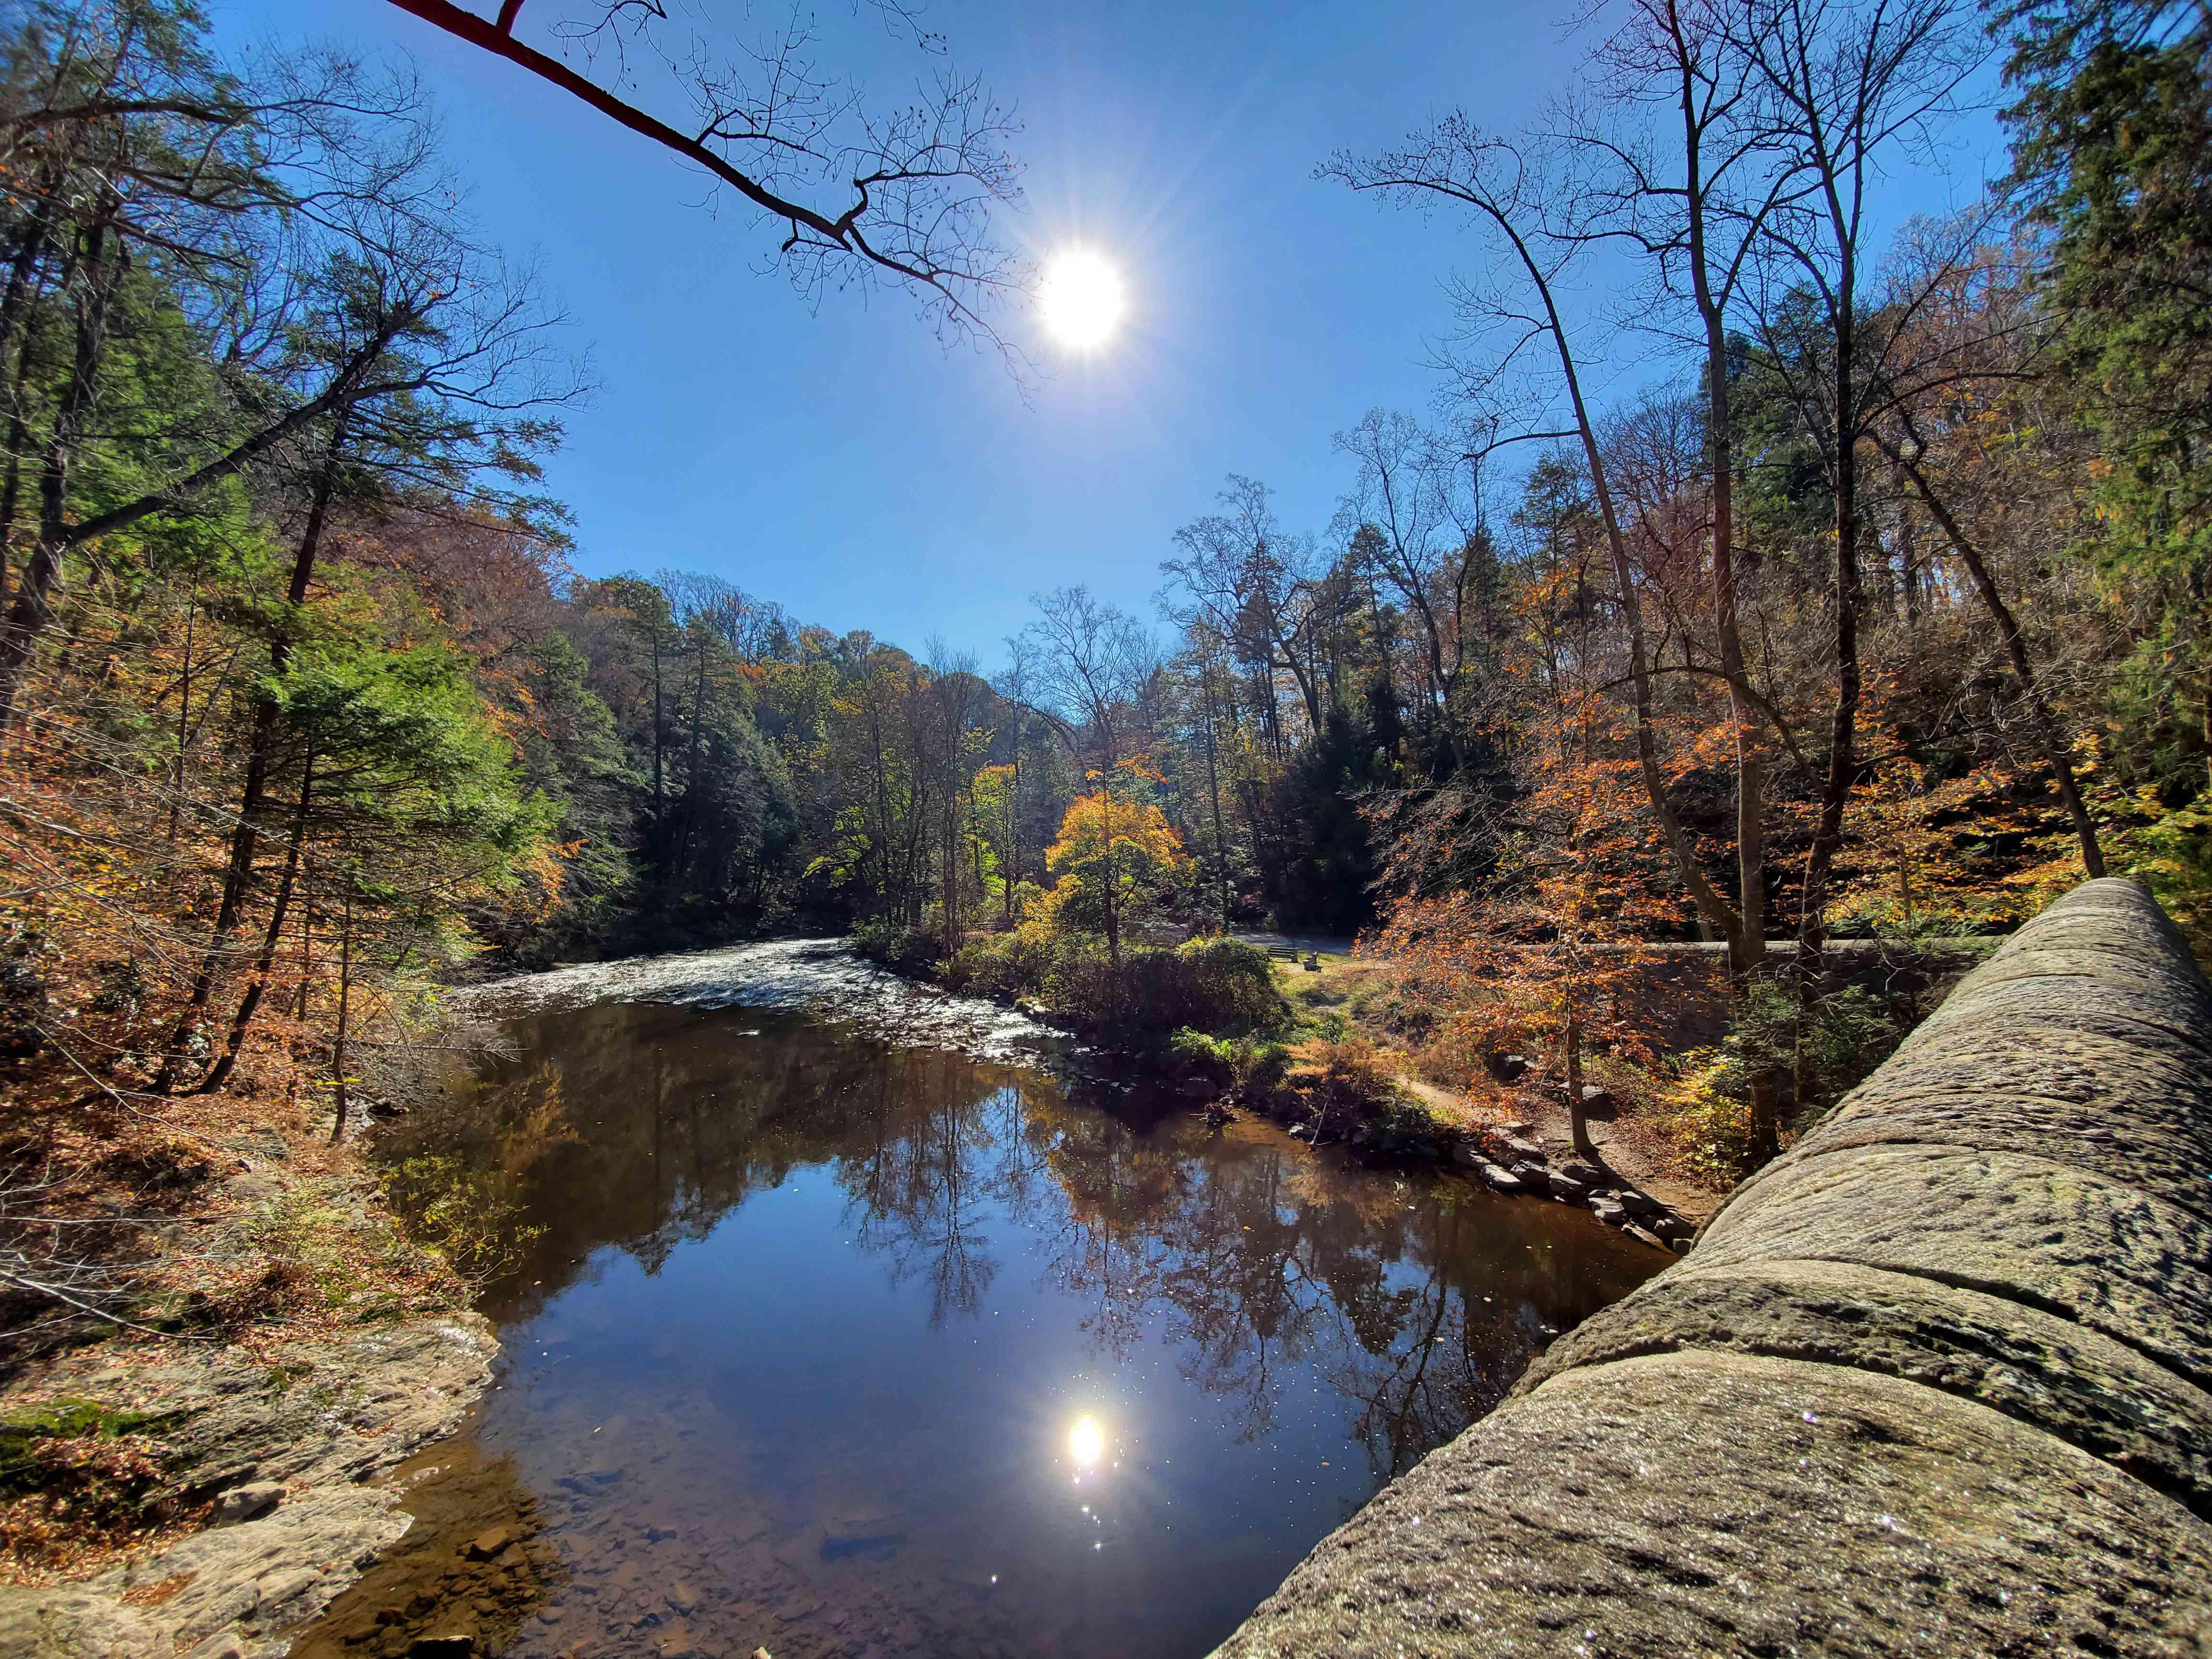 Wissahickon Creek en Wissahickon Valley Park en otoño